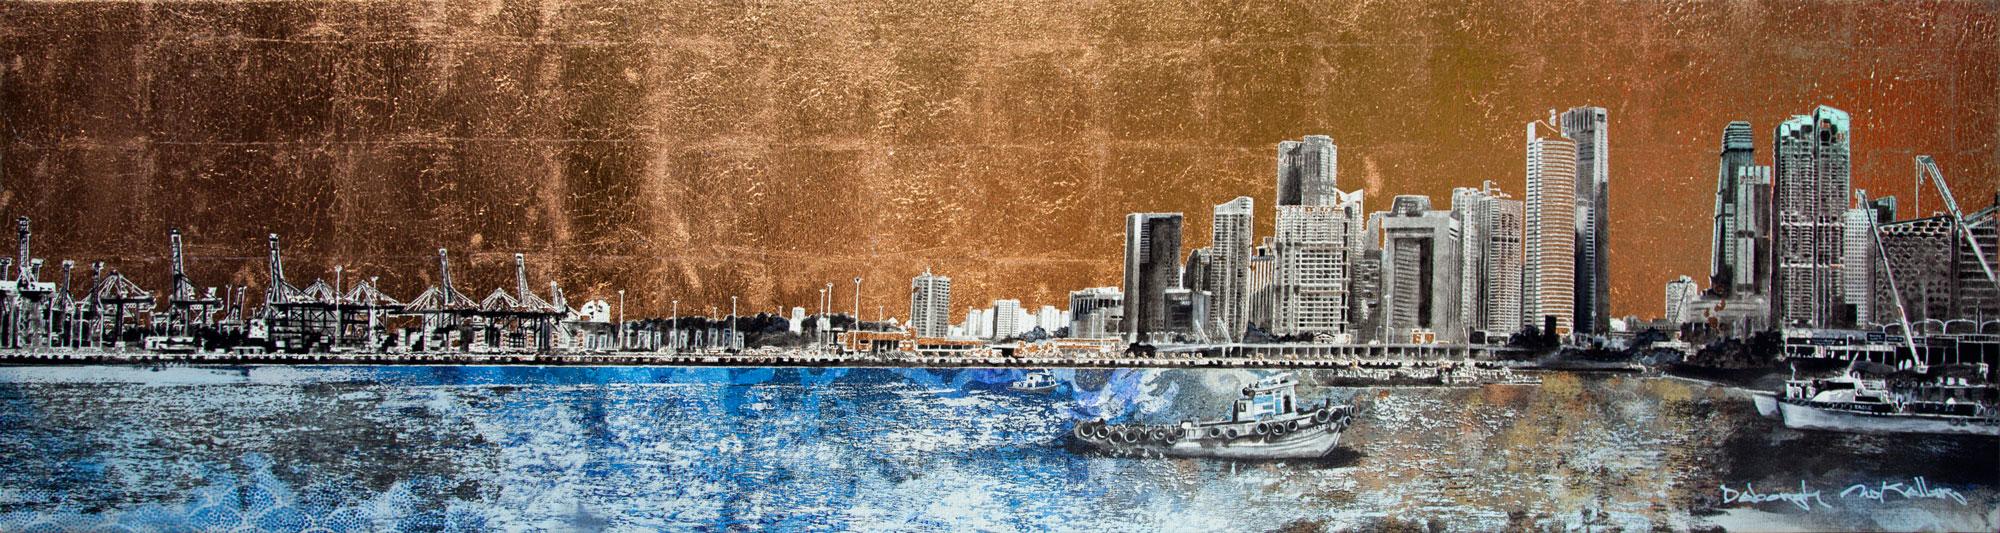 Port-City-RGB.jpg